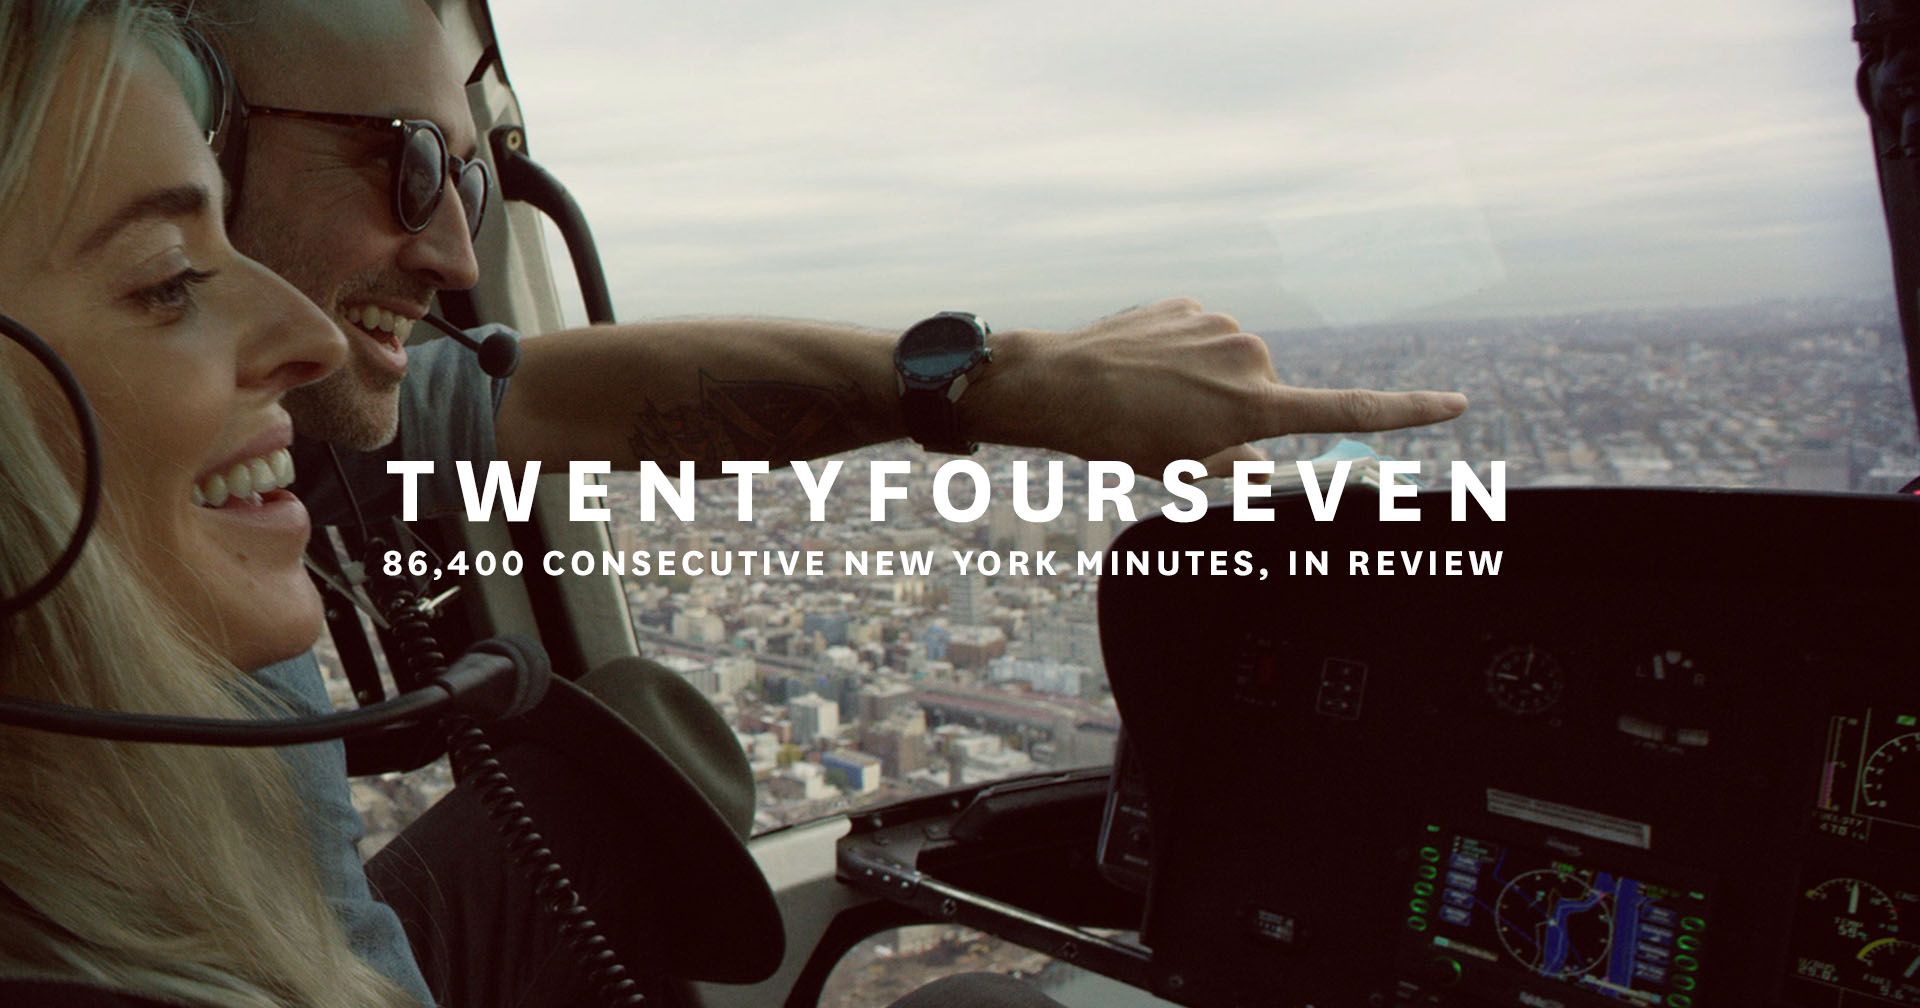 TwentyFourSeven – TAG Heuer